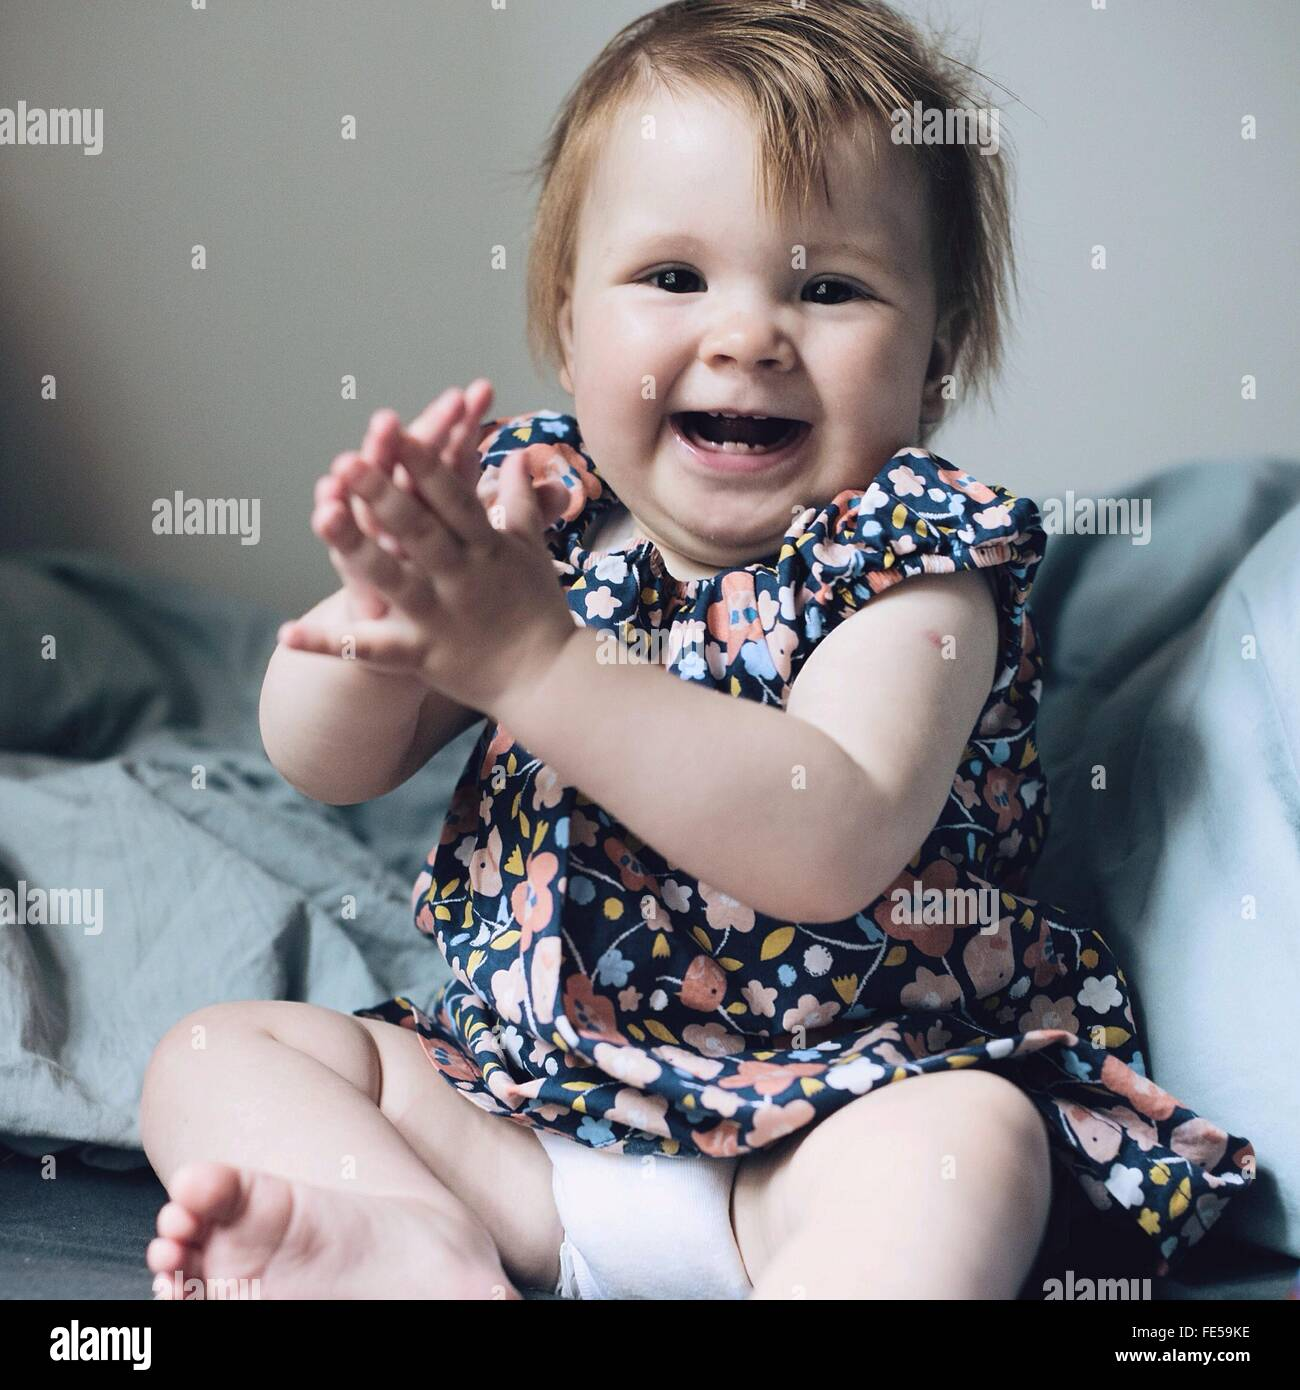 Baby Girl Laughing - Stock Image